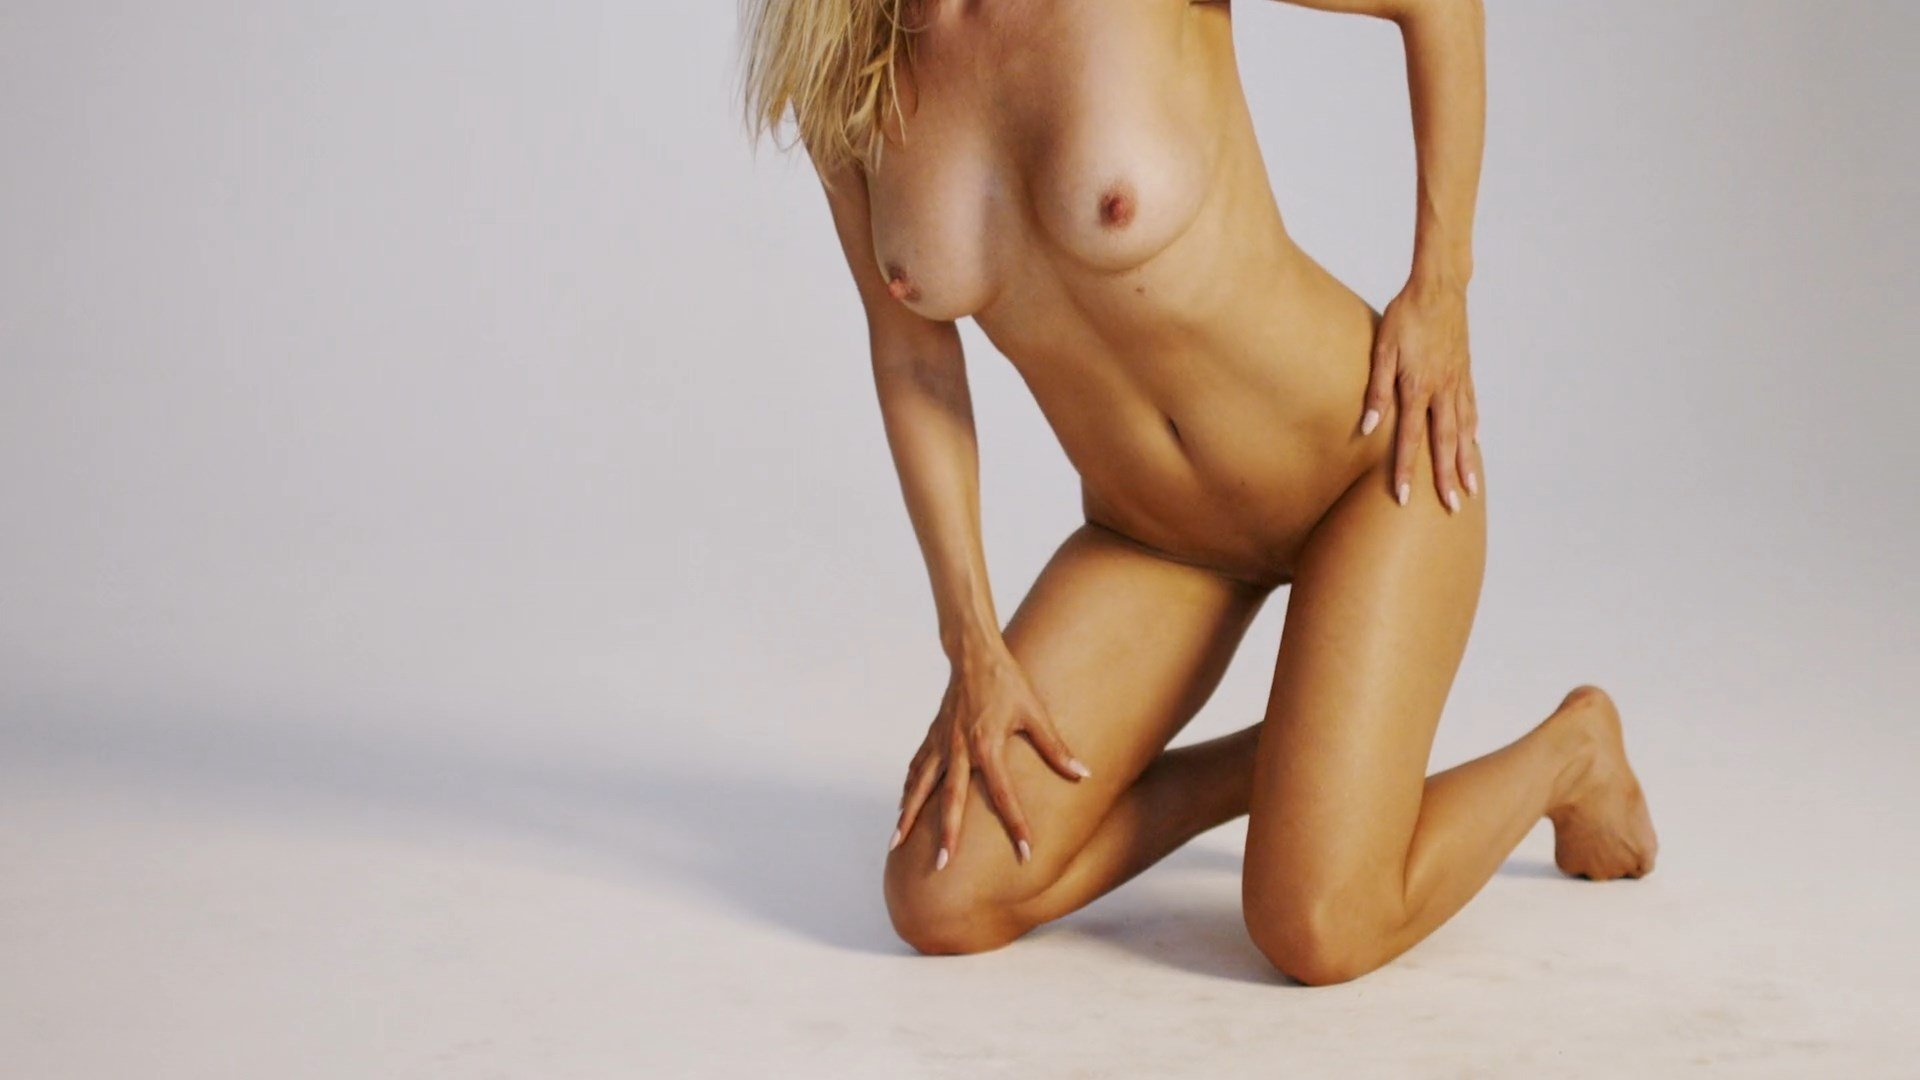 Joanna krupa pussy video — pic 6